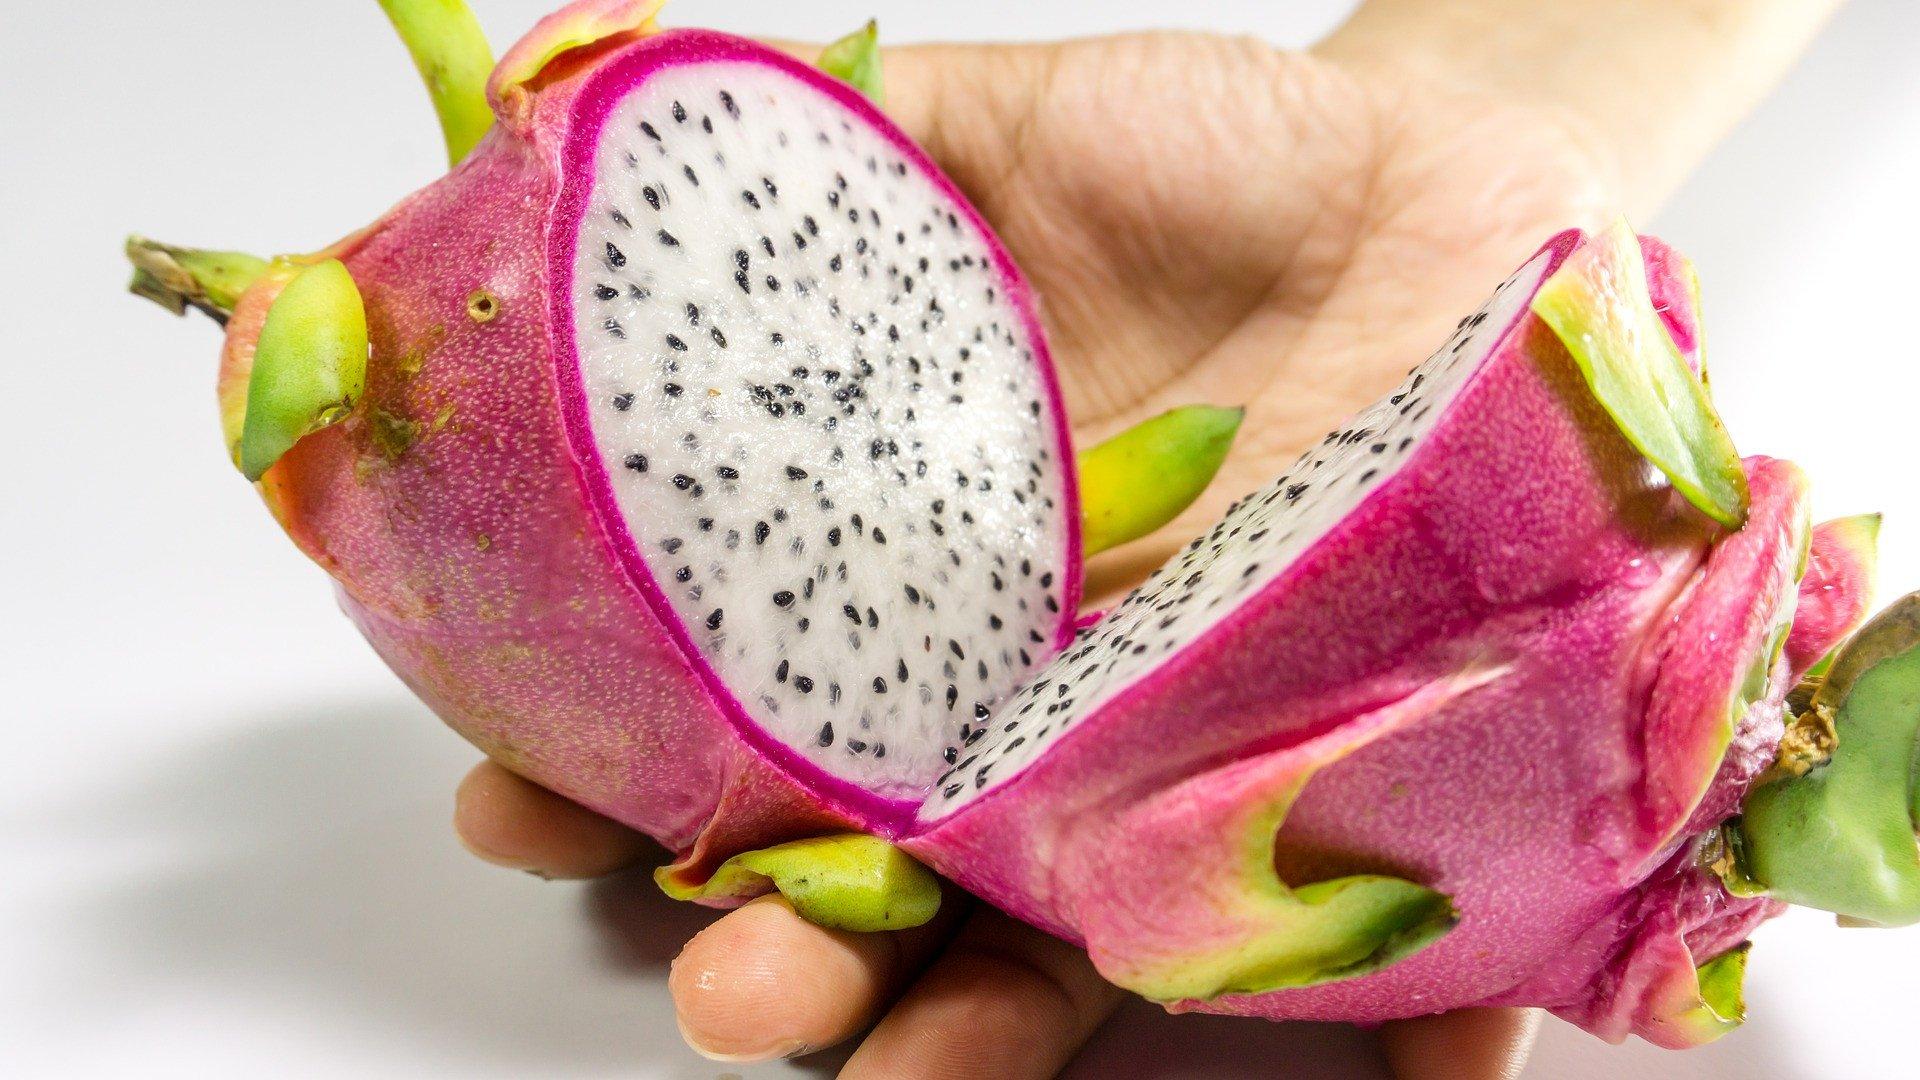 9 Benefits of White Dragon Fruit, Number 7 Effective to Lower Blood Sugar Levels - JPNN.com